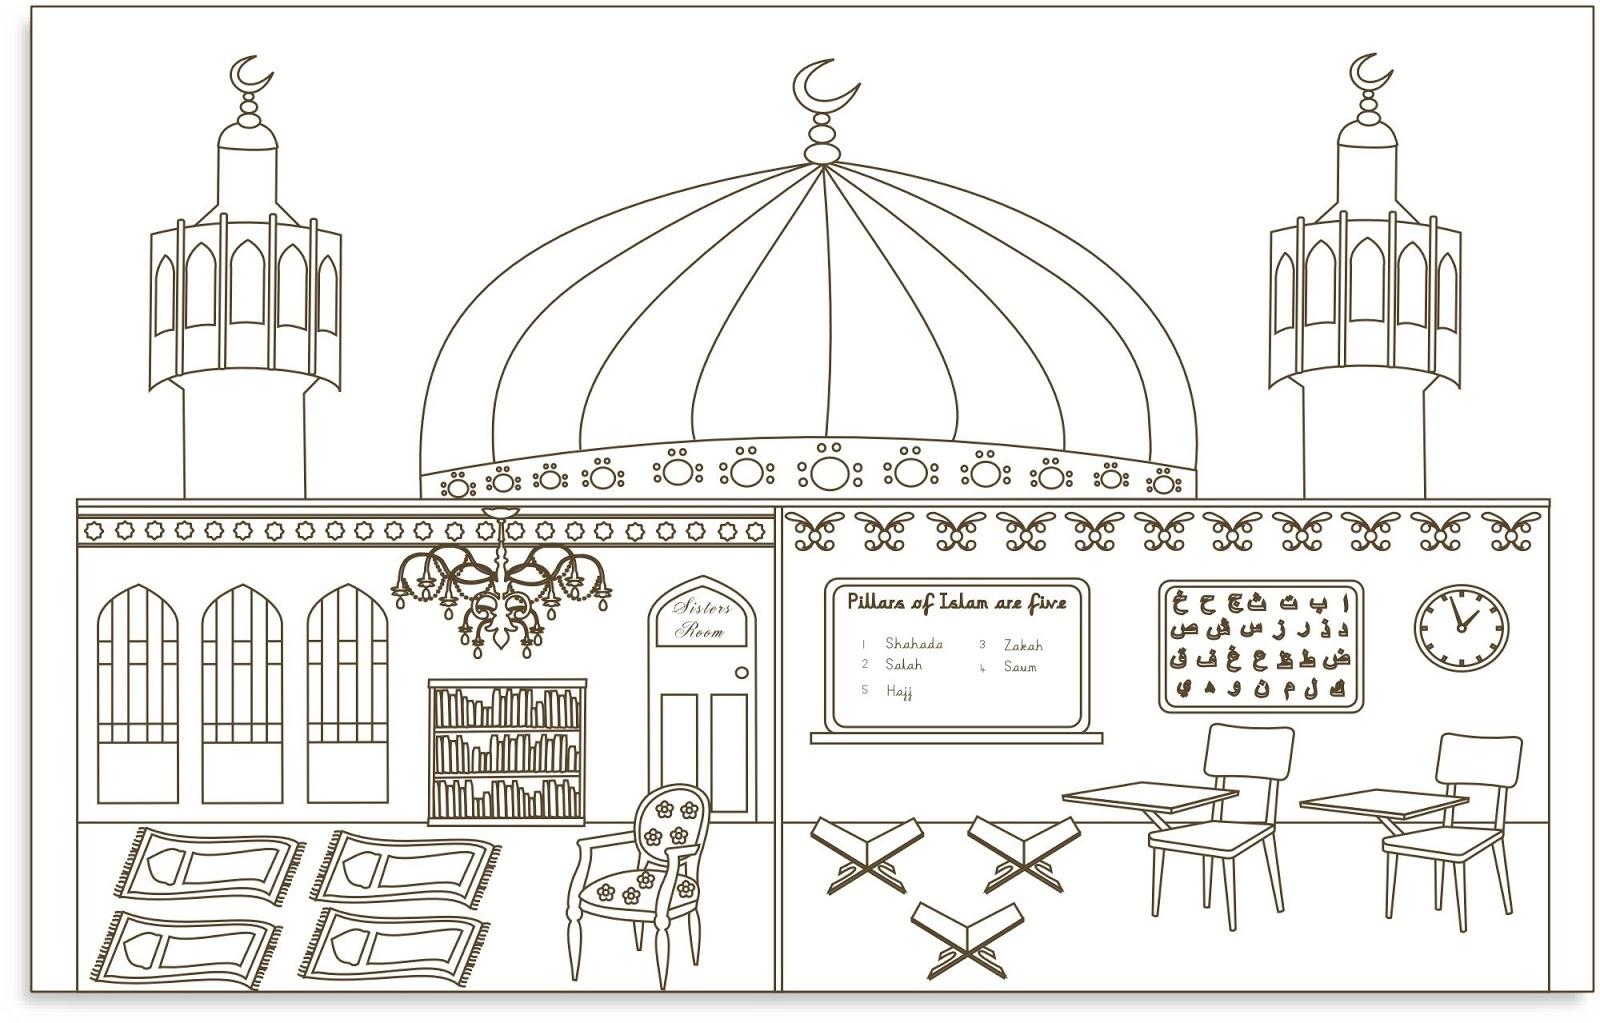 Gambar Mewarnai Masjid Dan Pemandangan Gambar Mewarnai